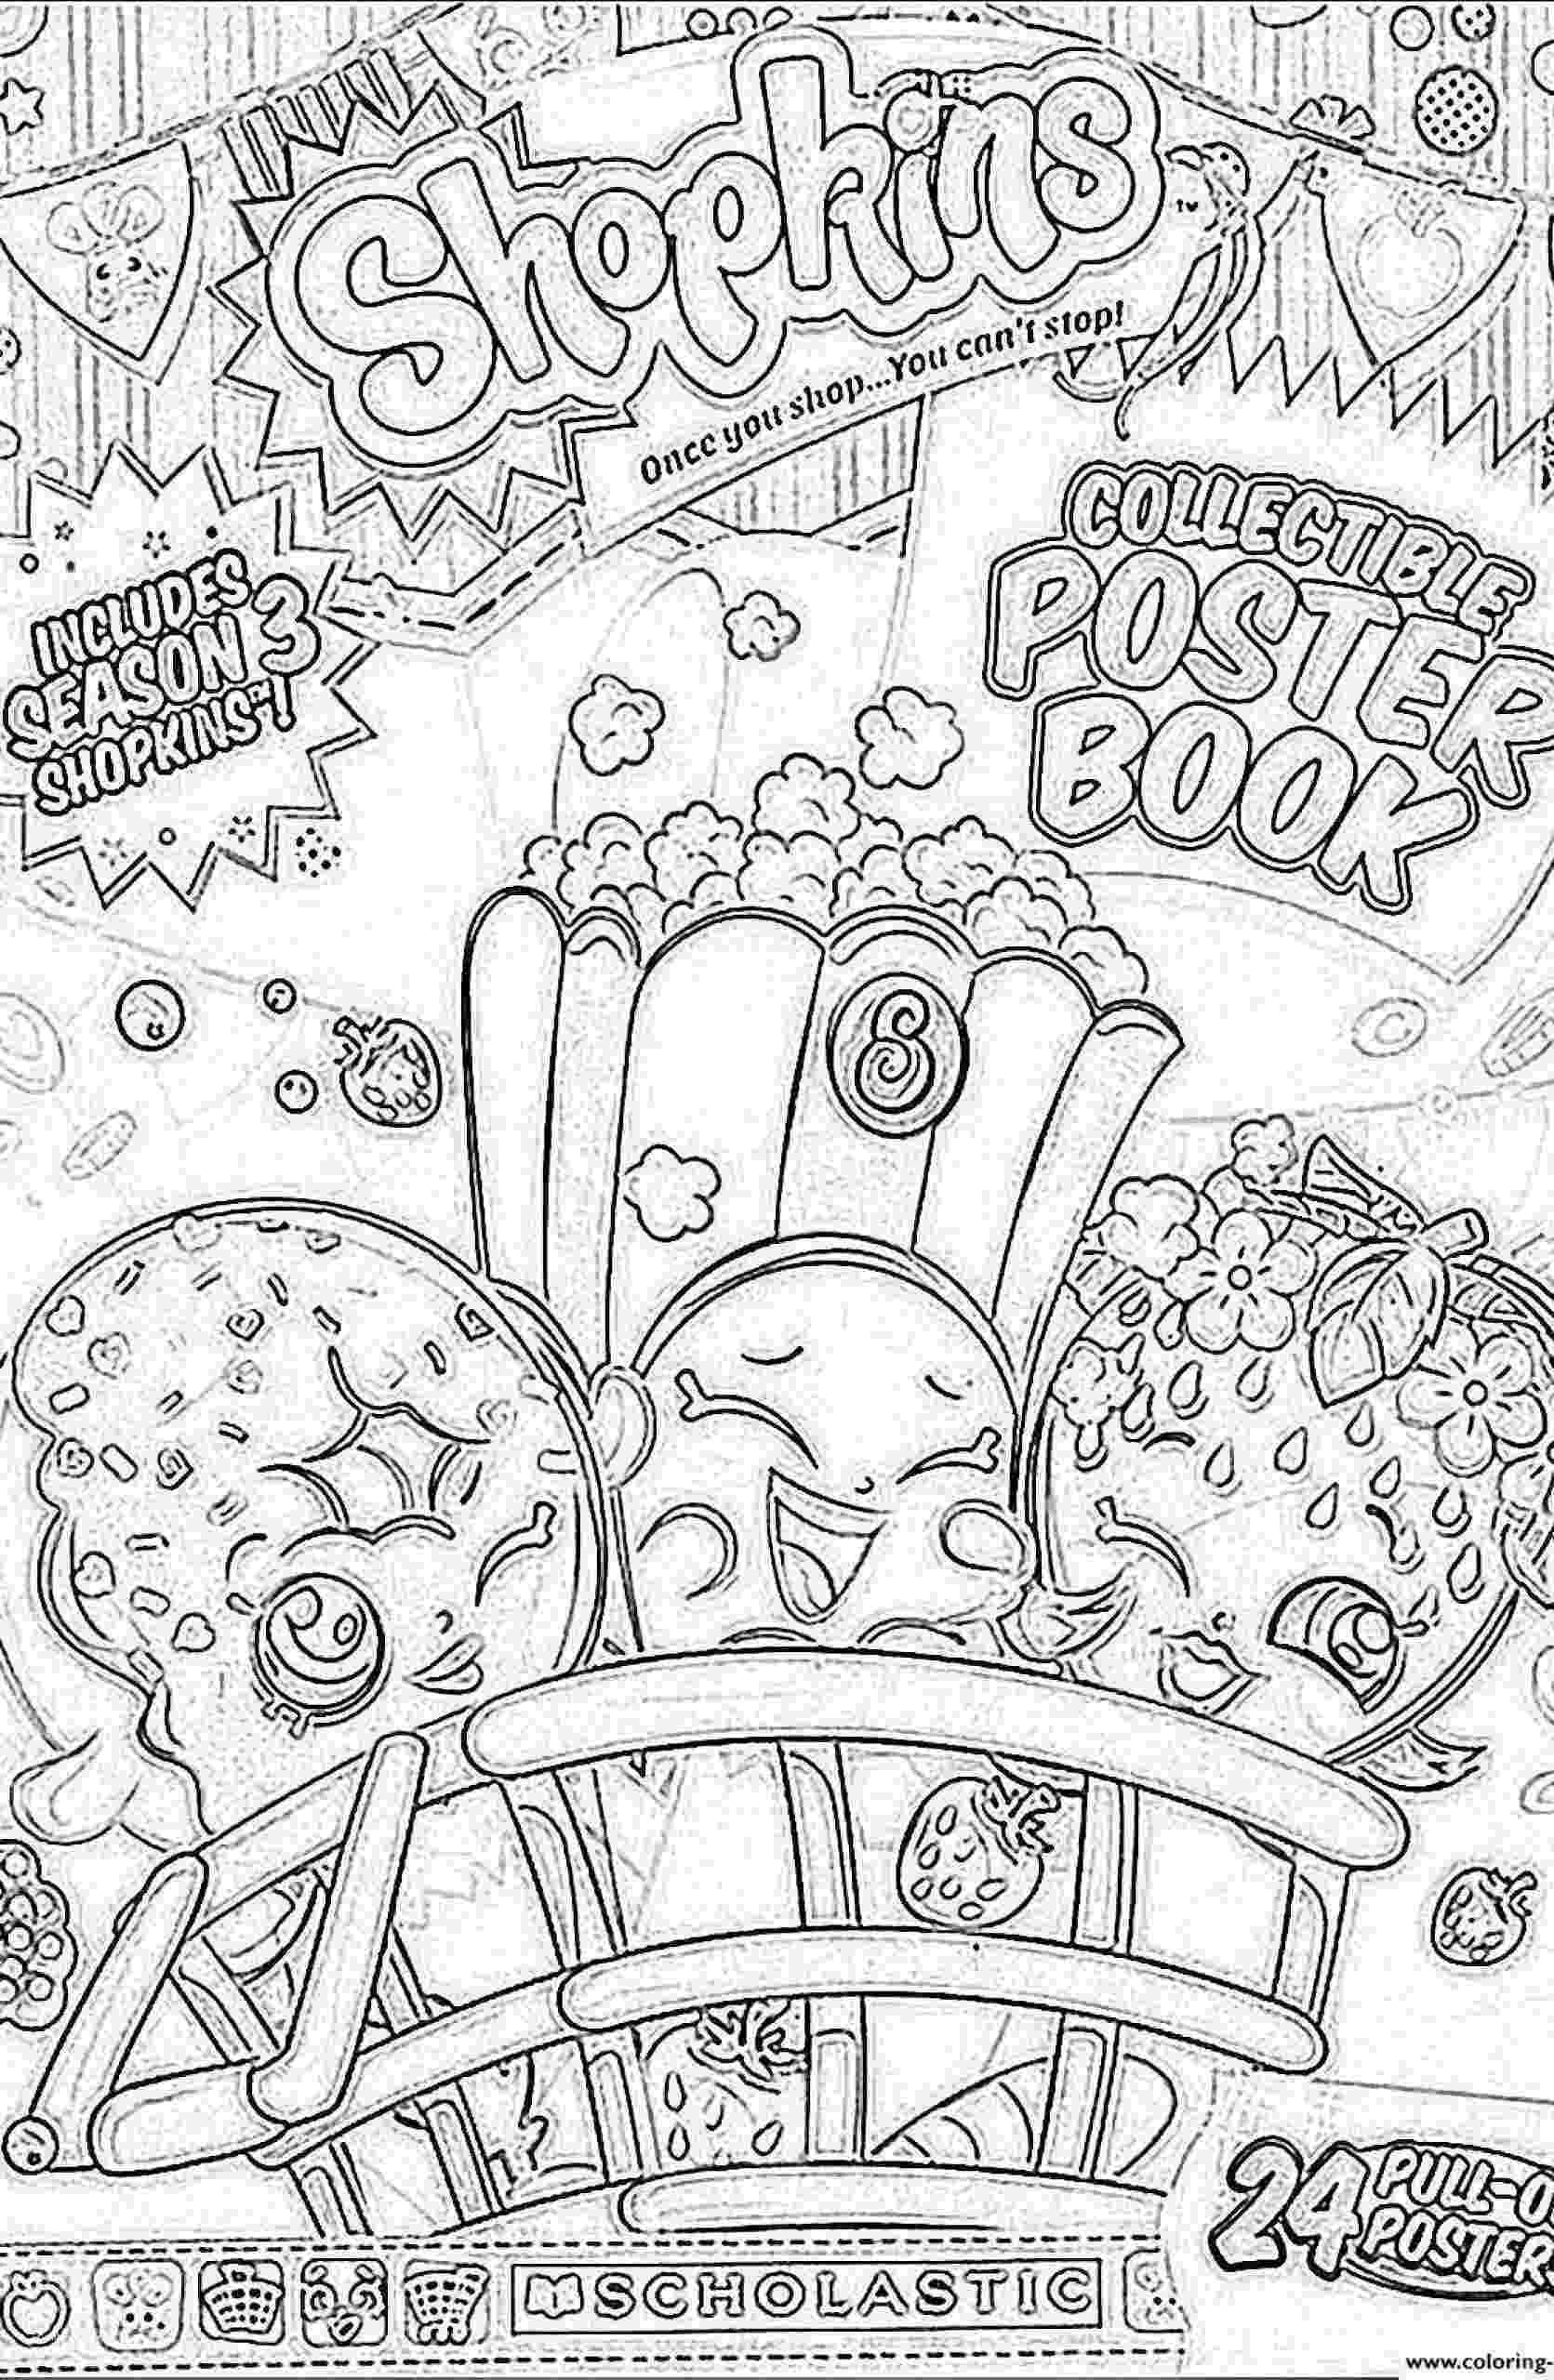 vybz kartel coloring book download hulk vybz kartel dead already original version by joelitooow kartel hulk vybz download book coloring